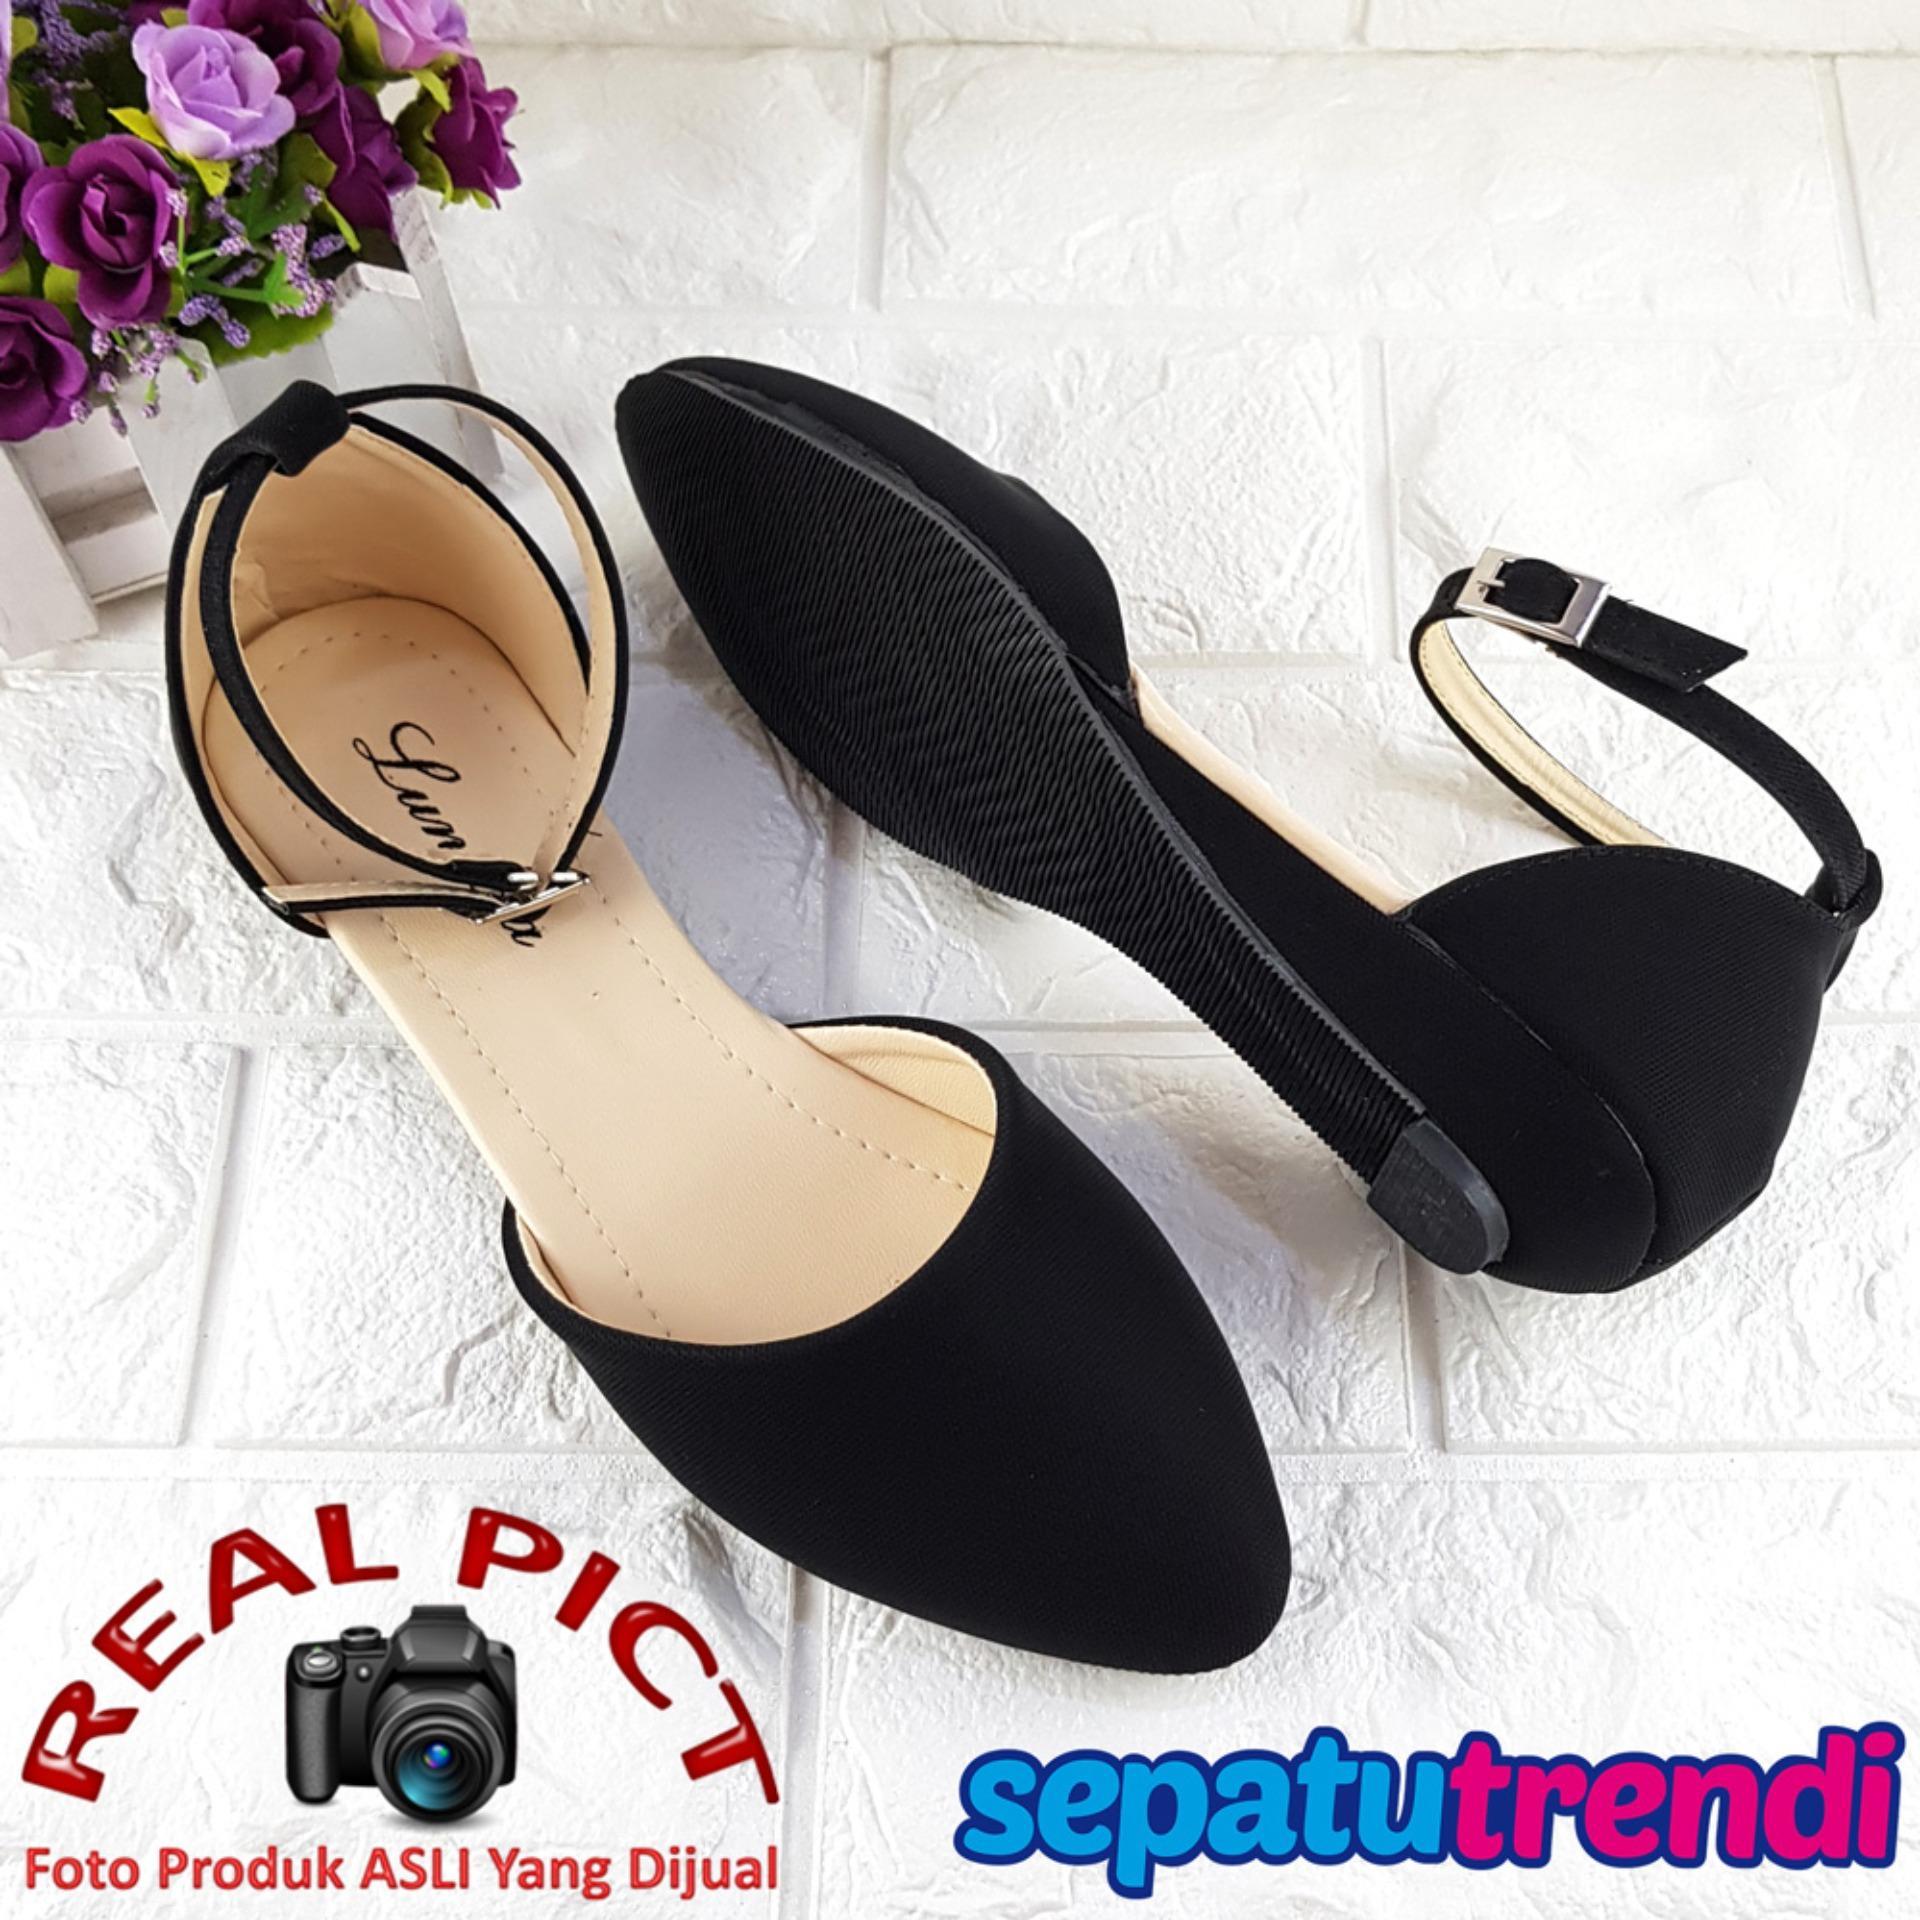 Dapatkan Segera Lunetta Sepatu Wanita Hak Pendek D Orsay Ankle Bracelet Luglhk